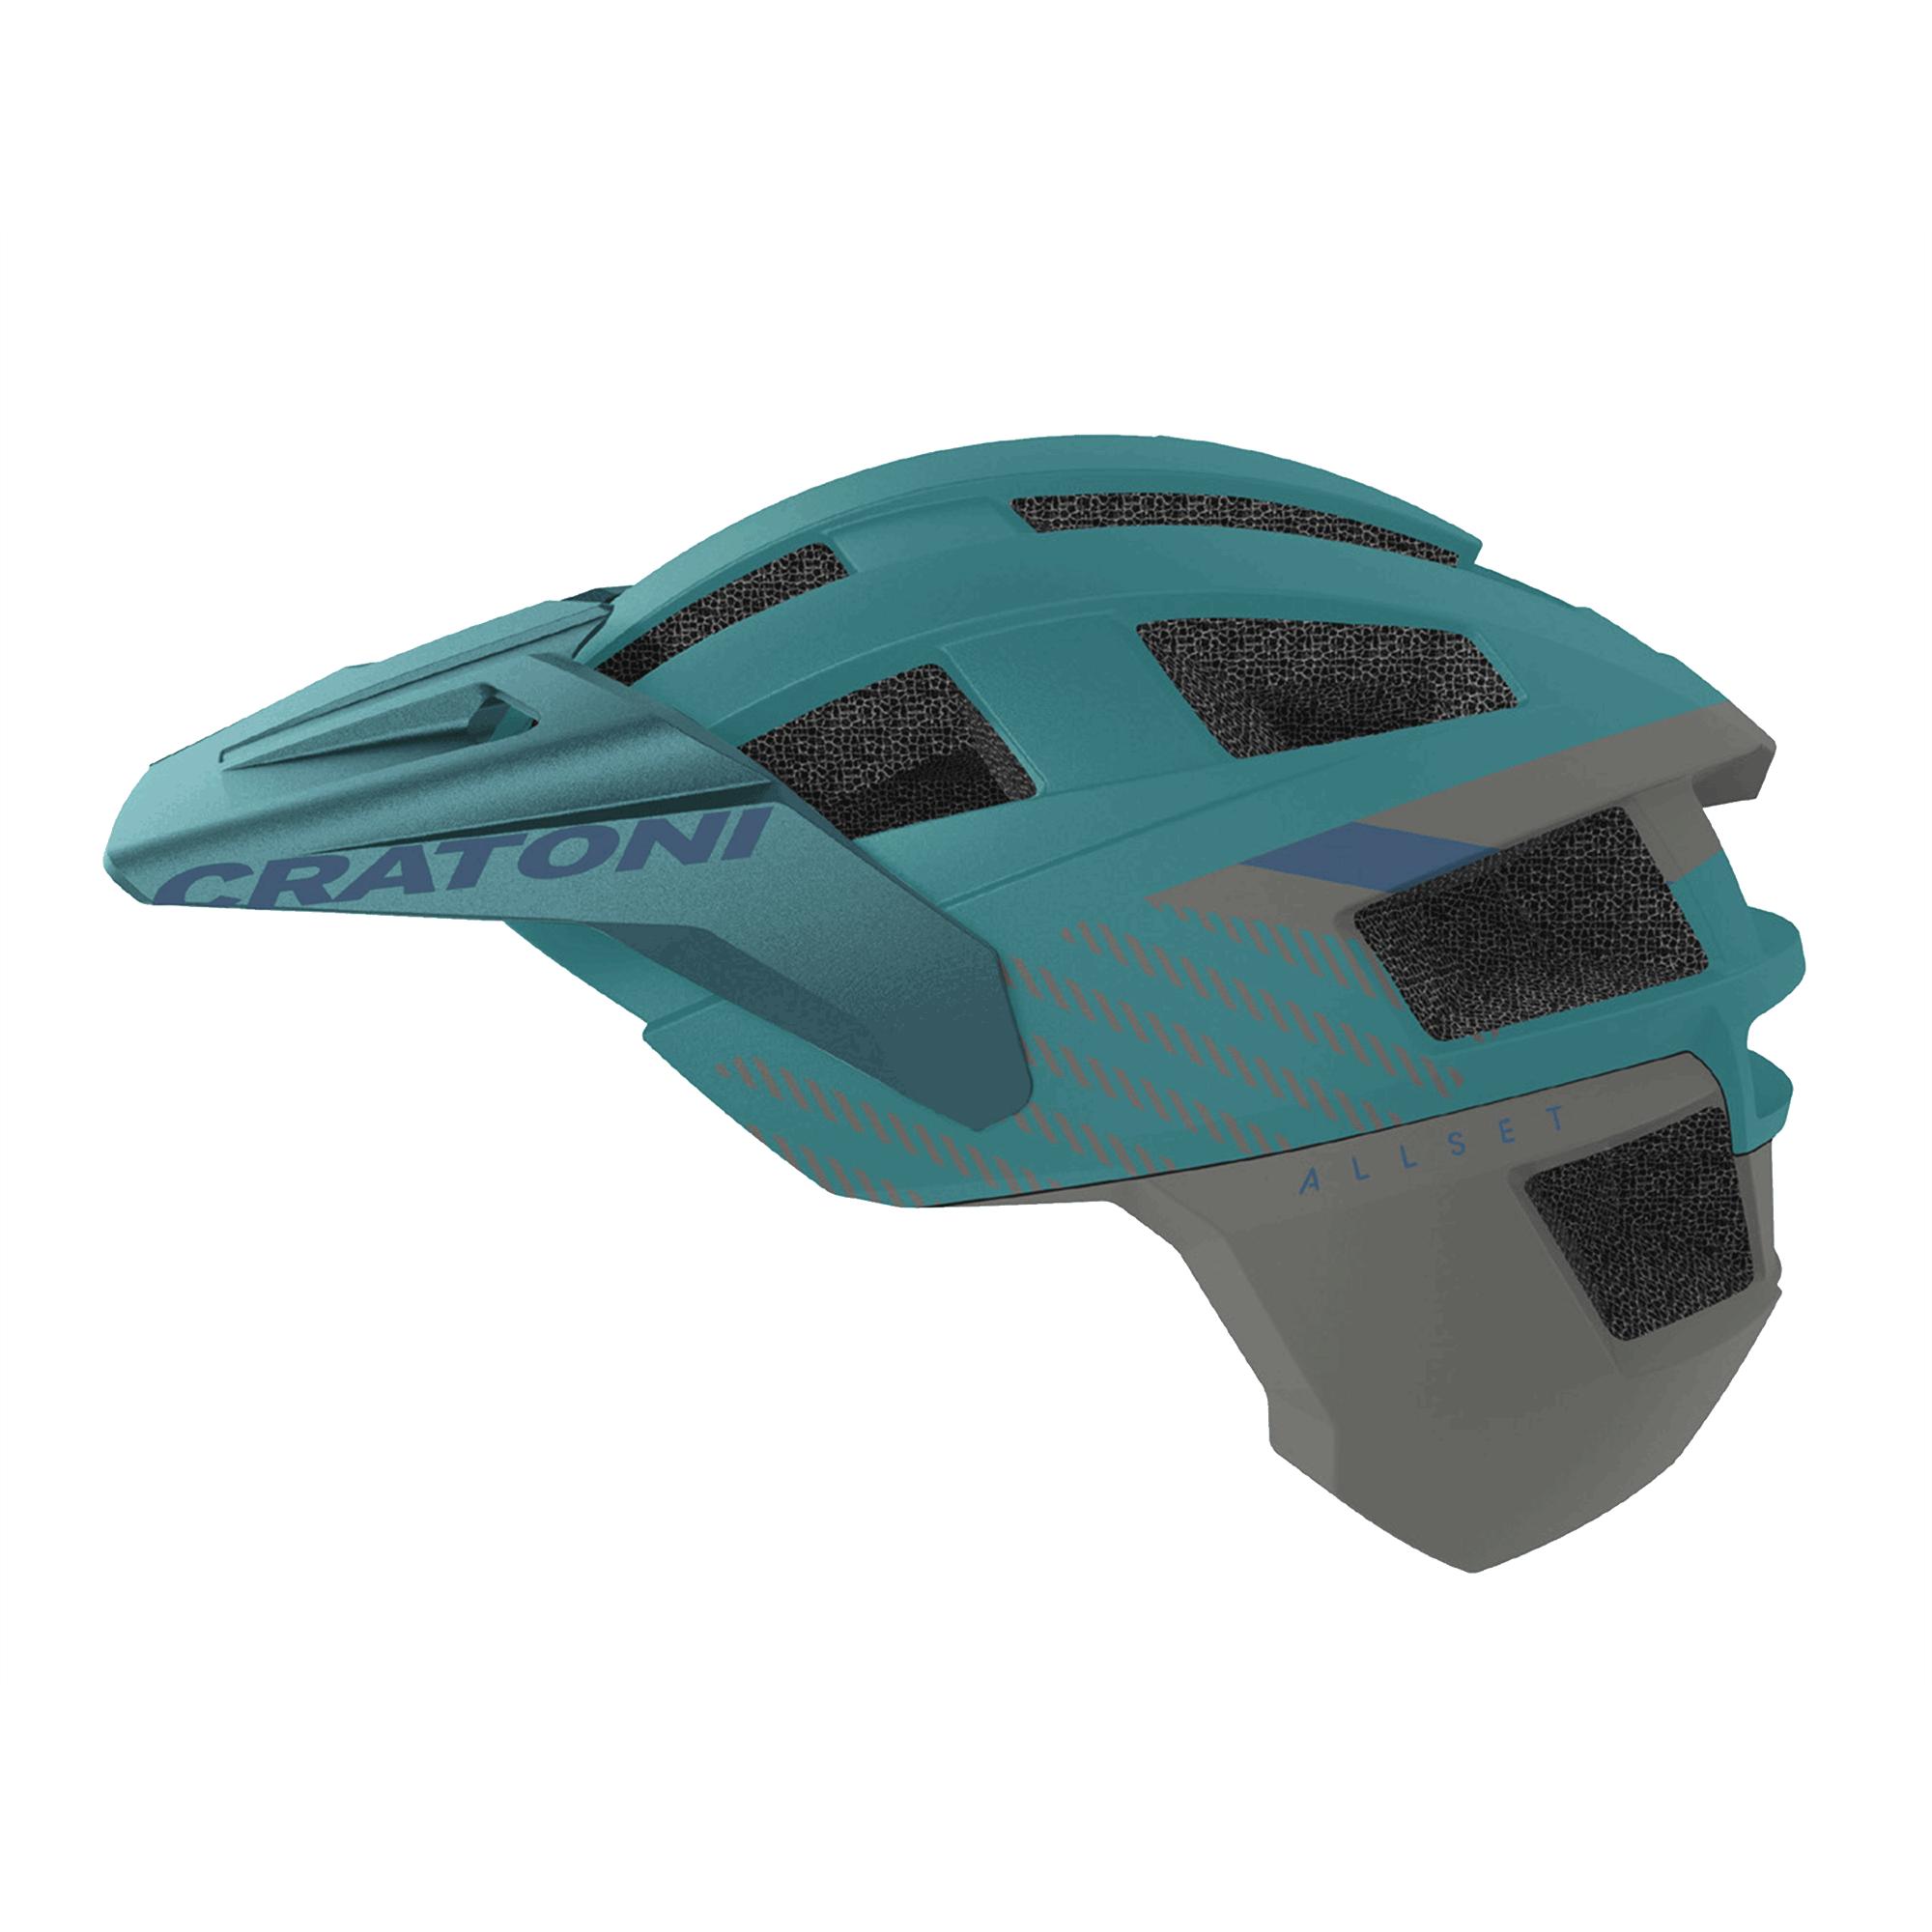 AllSet-Pro Jr. turquoise-antheracite matt